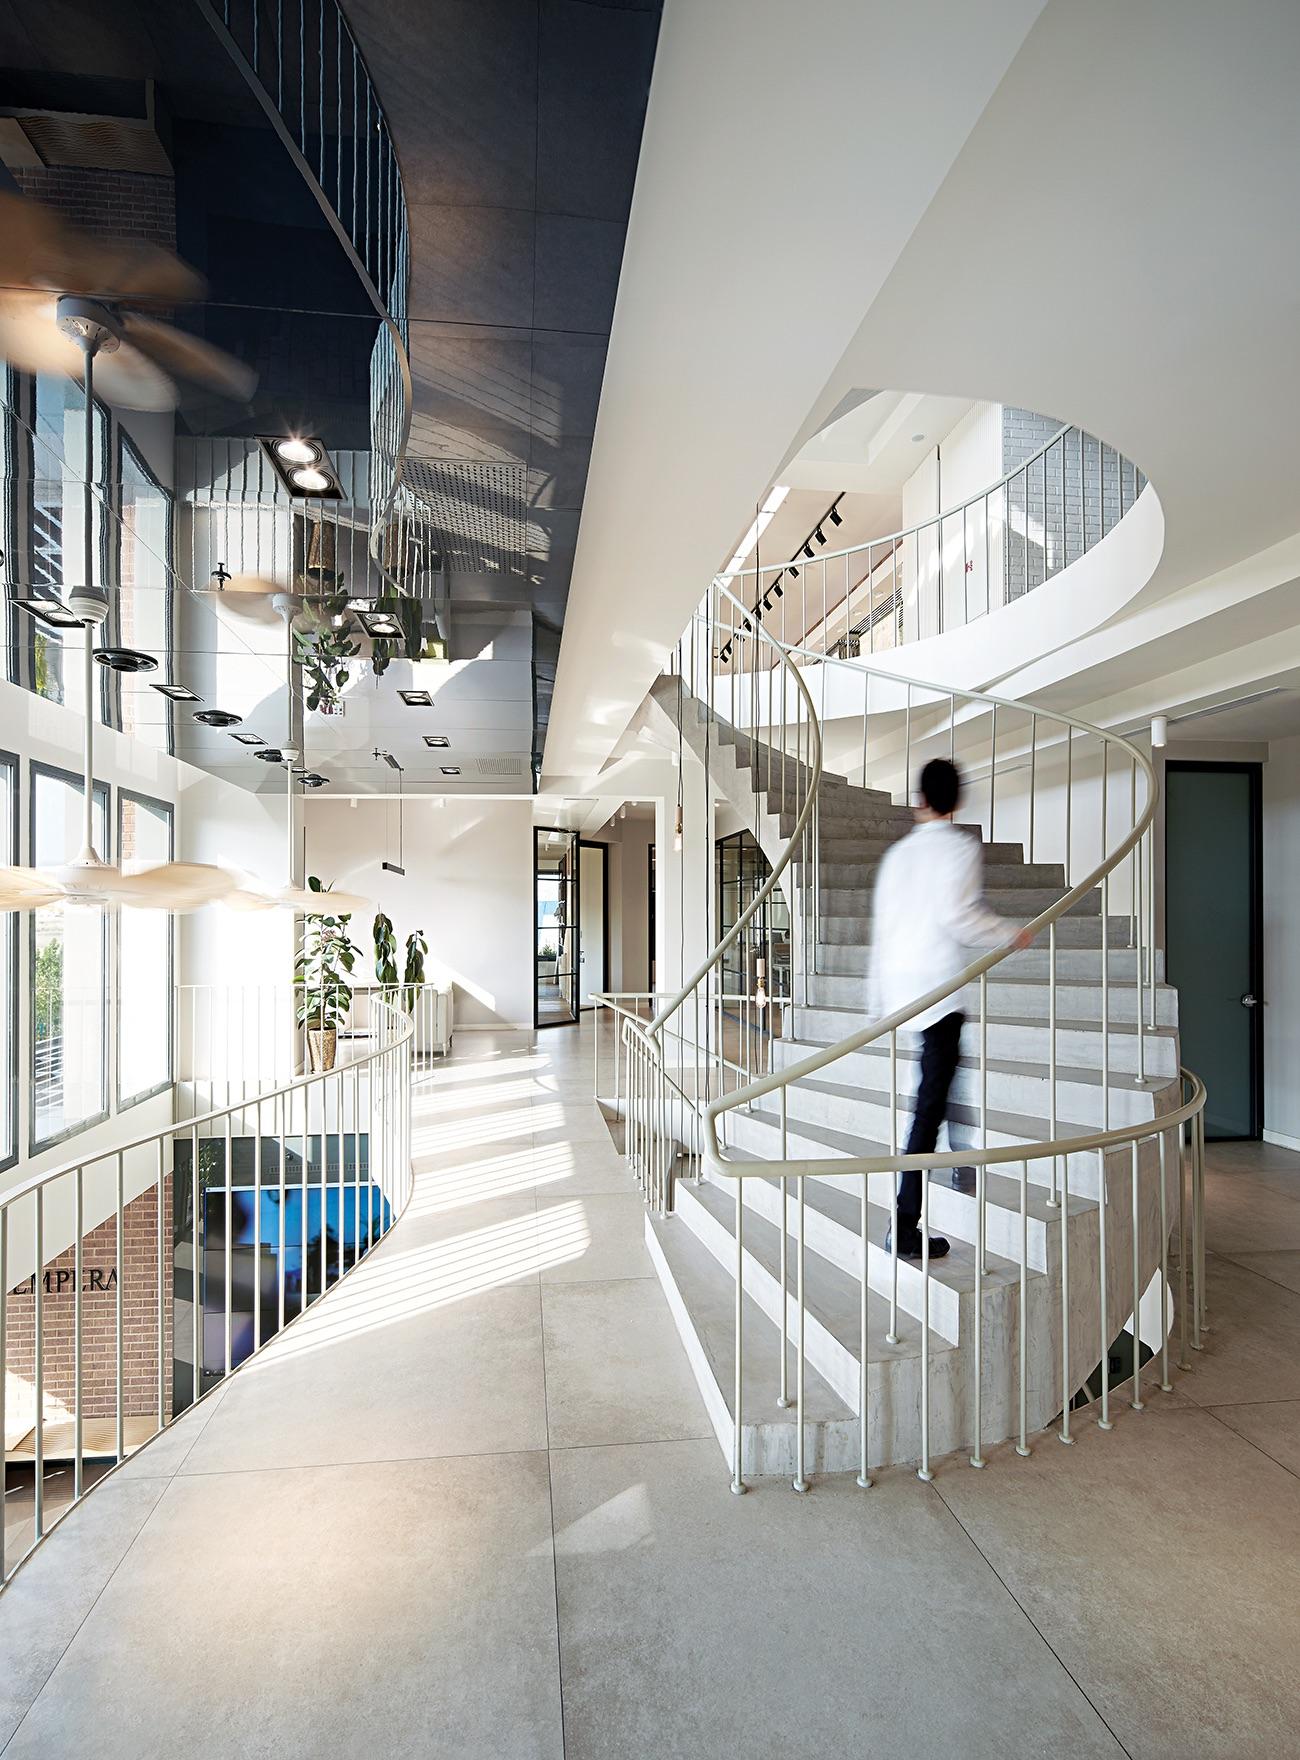 Yerce Architecture